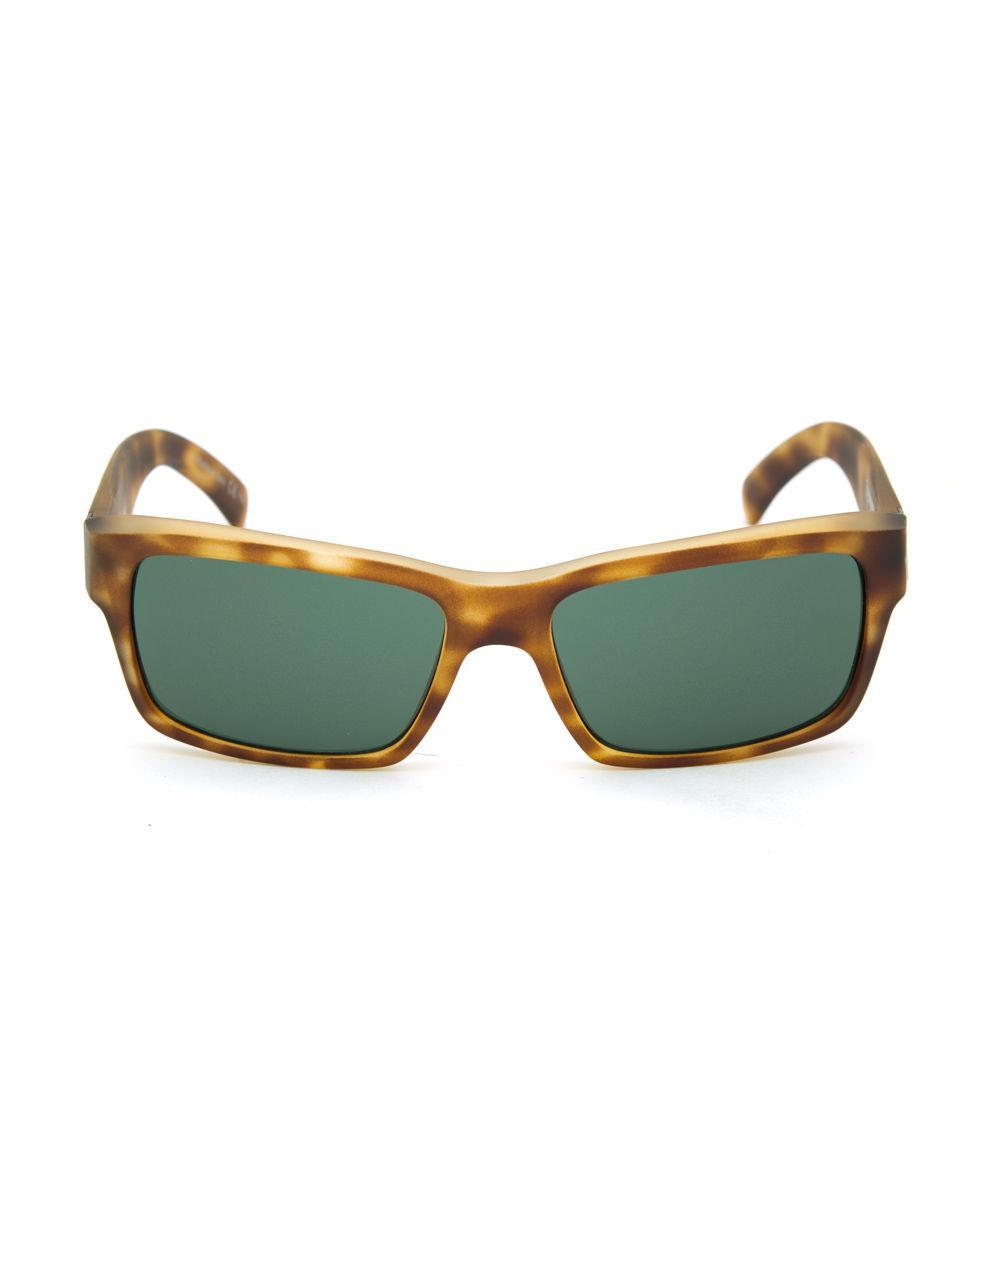 a7cf4ed4979 Lyst - Von Zipper Fulton Tortoise Satin   Vintage Grey Sunglasses in Gray  for Men